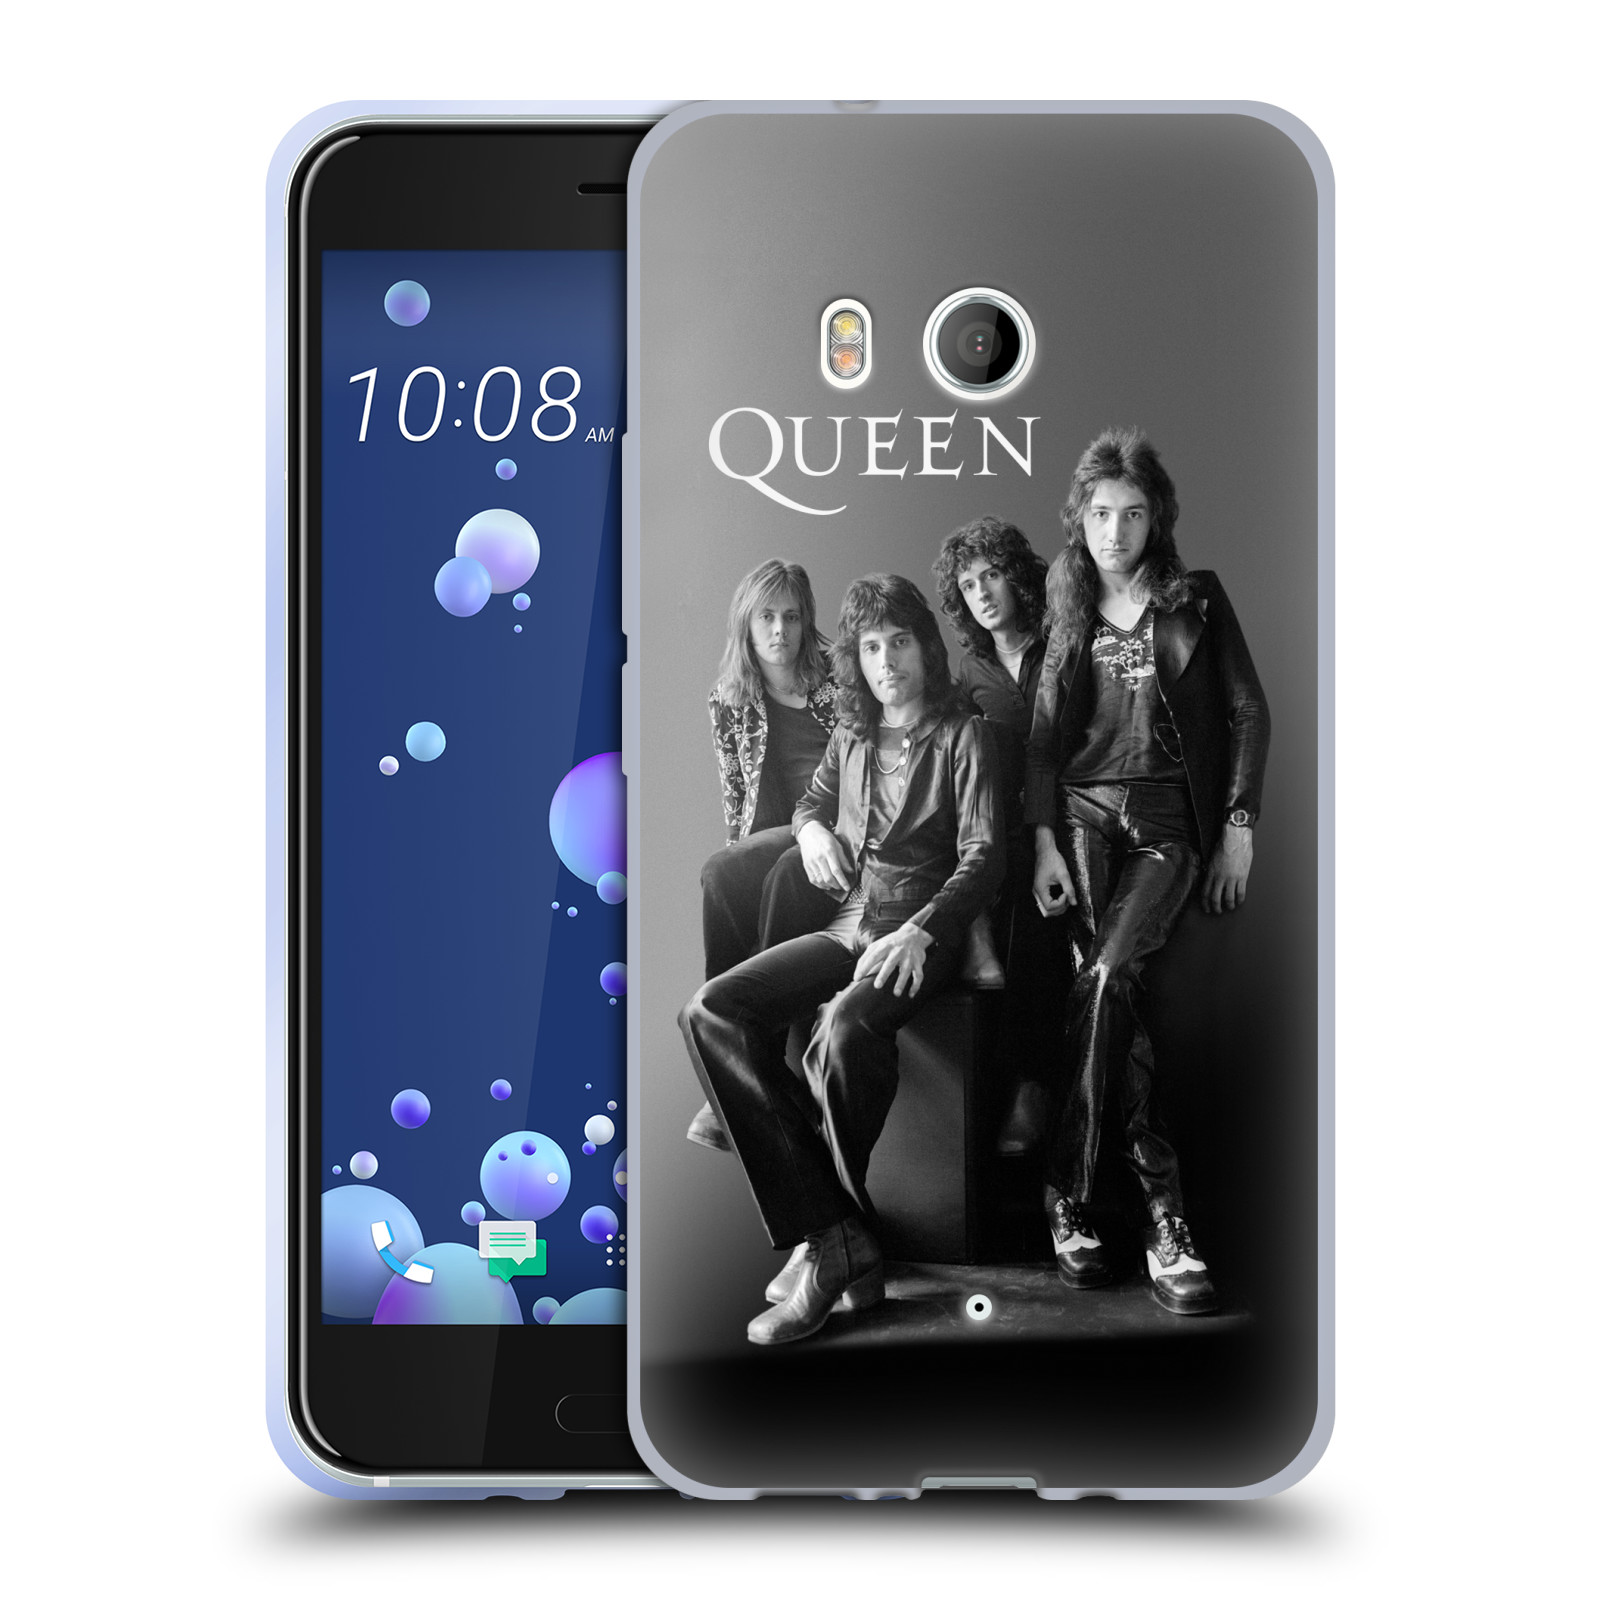 Silikonové pouzdro na mobil HTC U11 - Head Case - Queen - Skupina